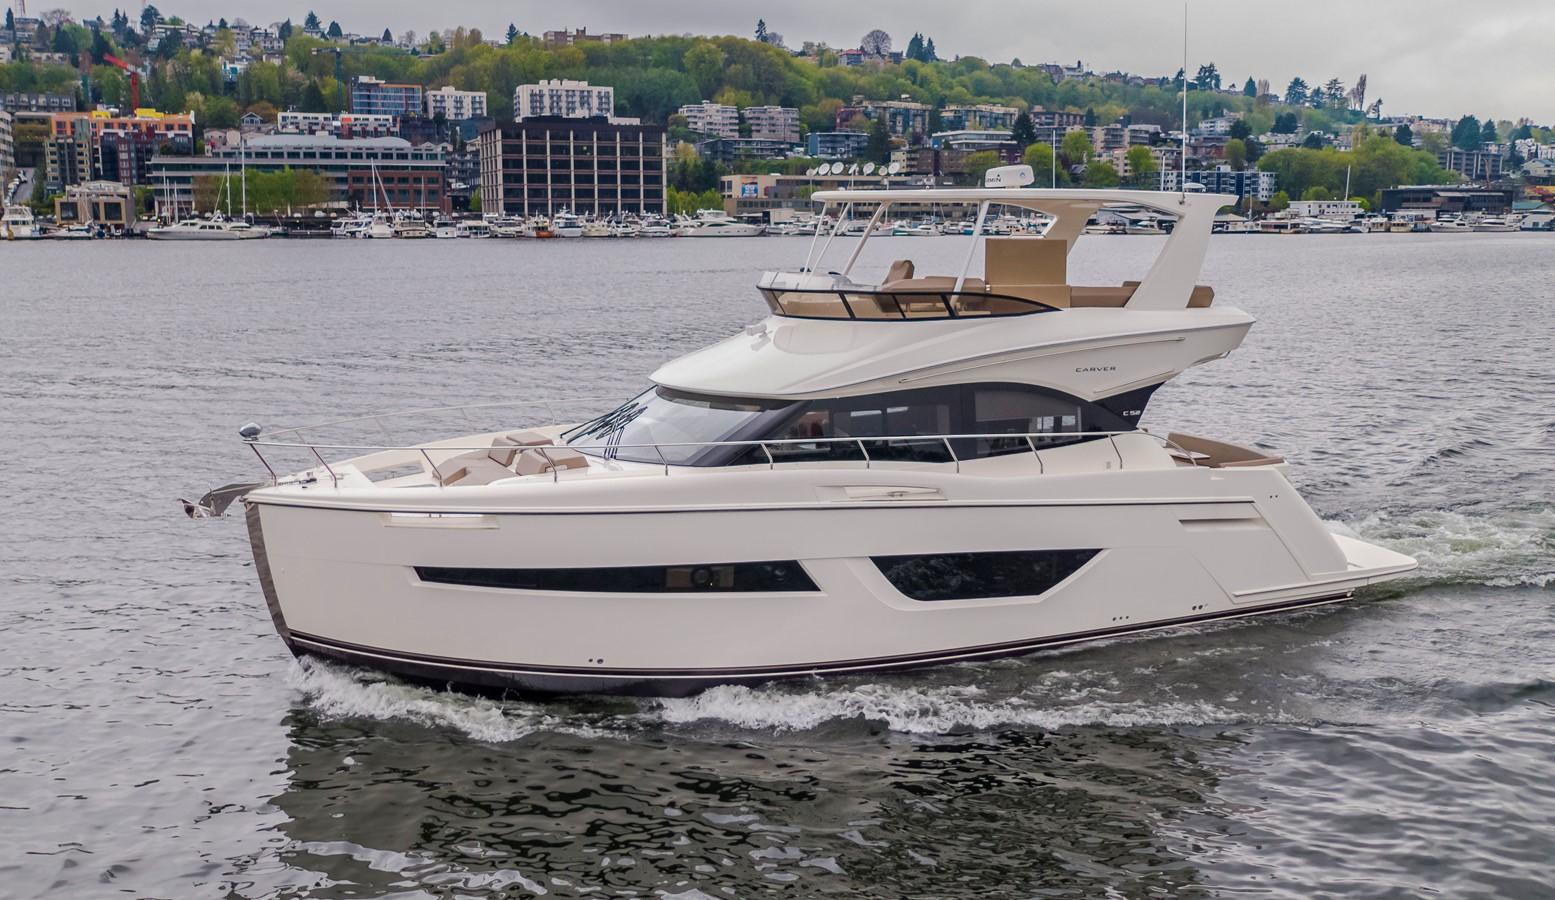 2019 CARVER C52 Motor Yacht 2520776